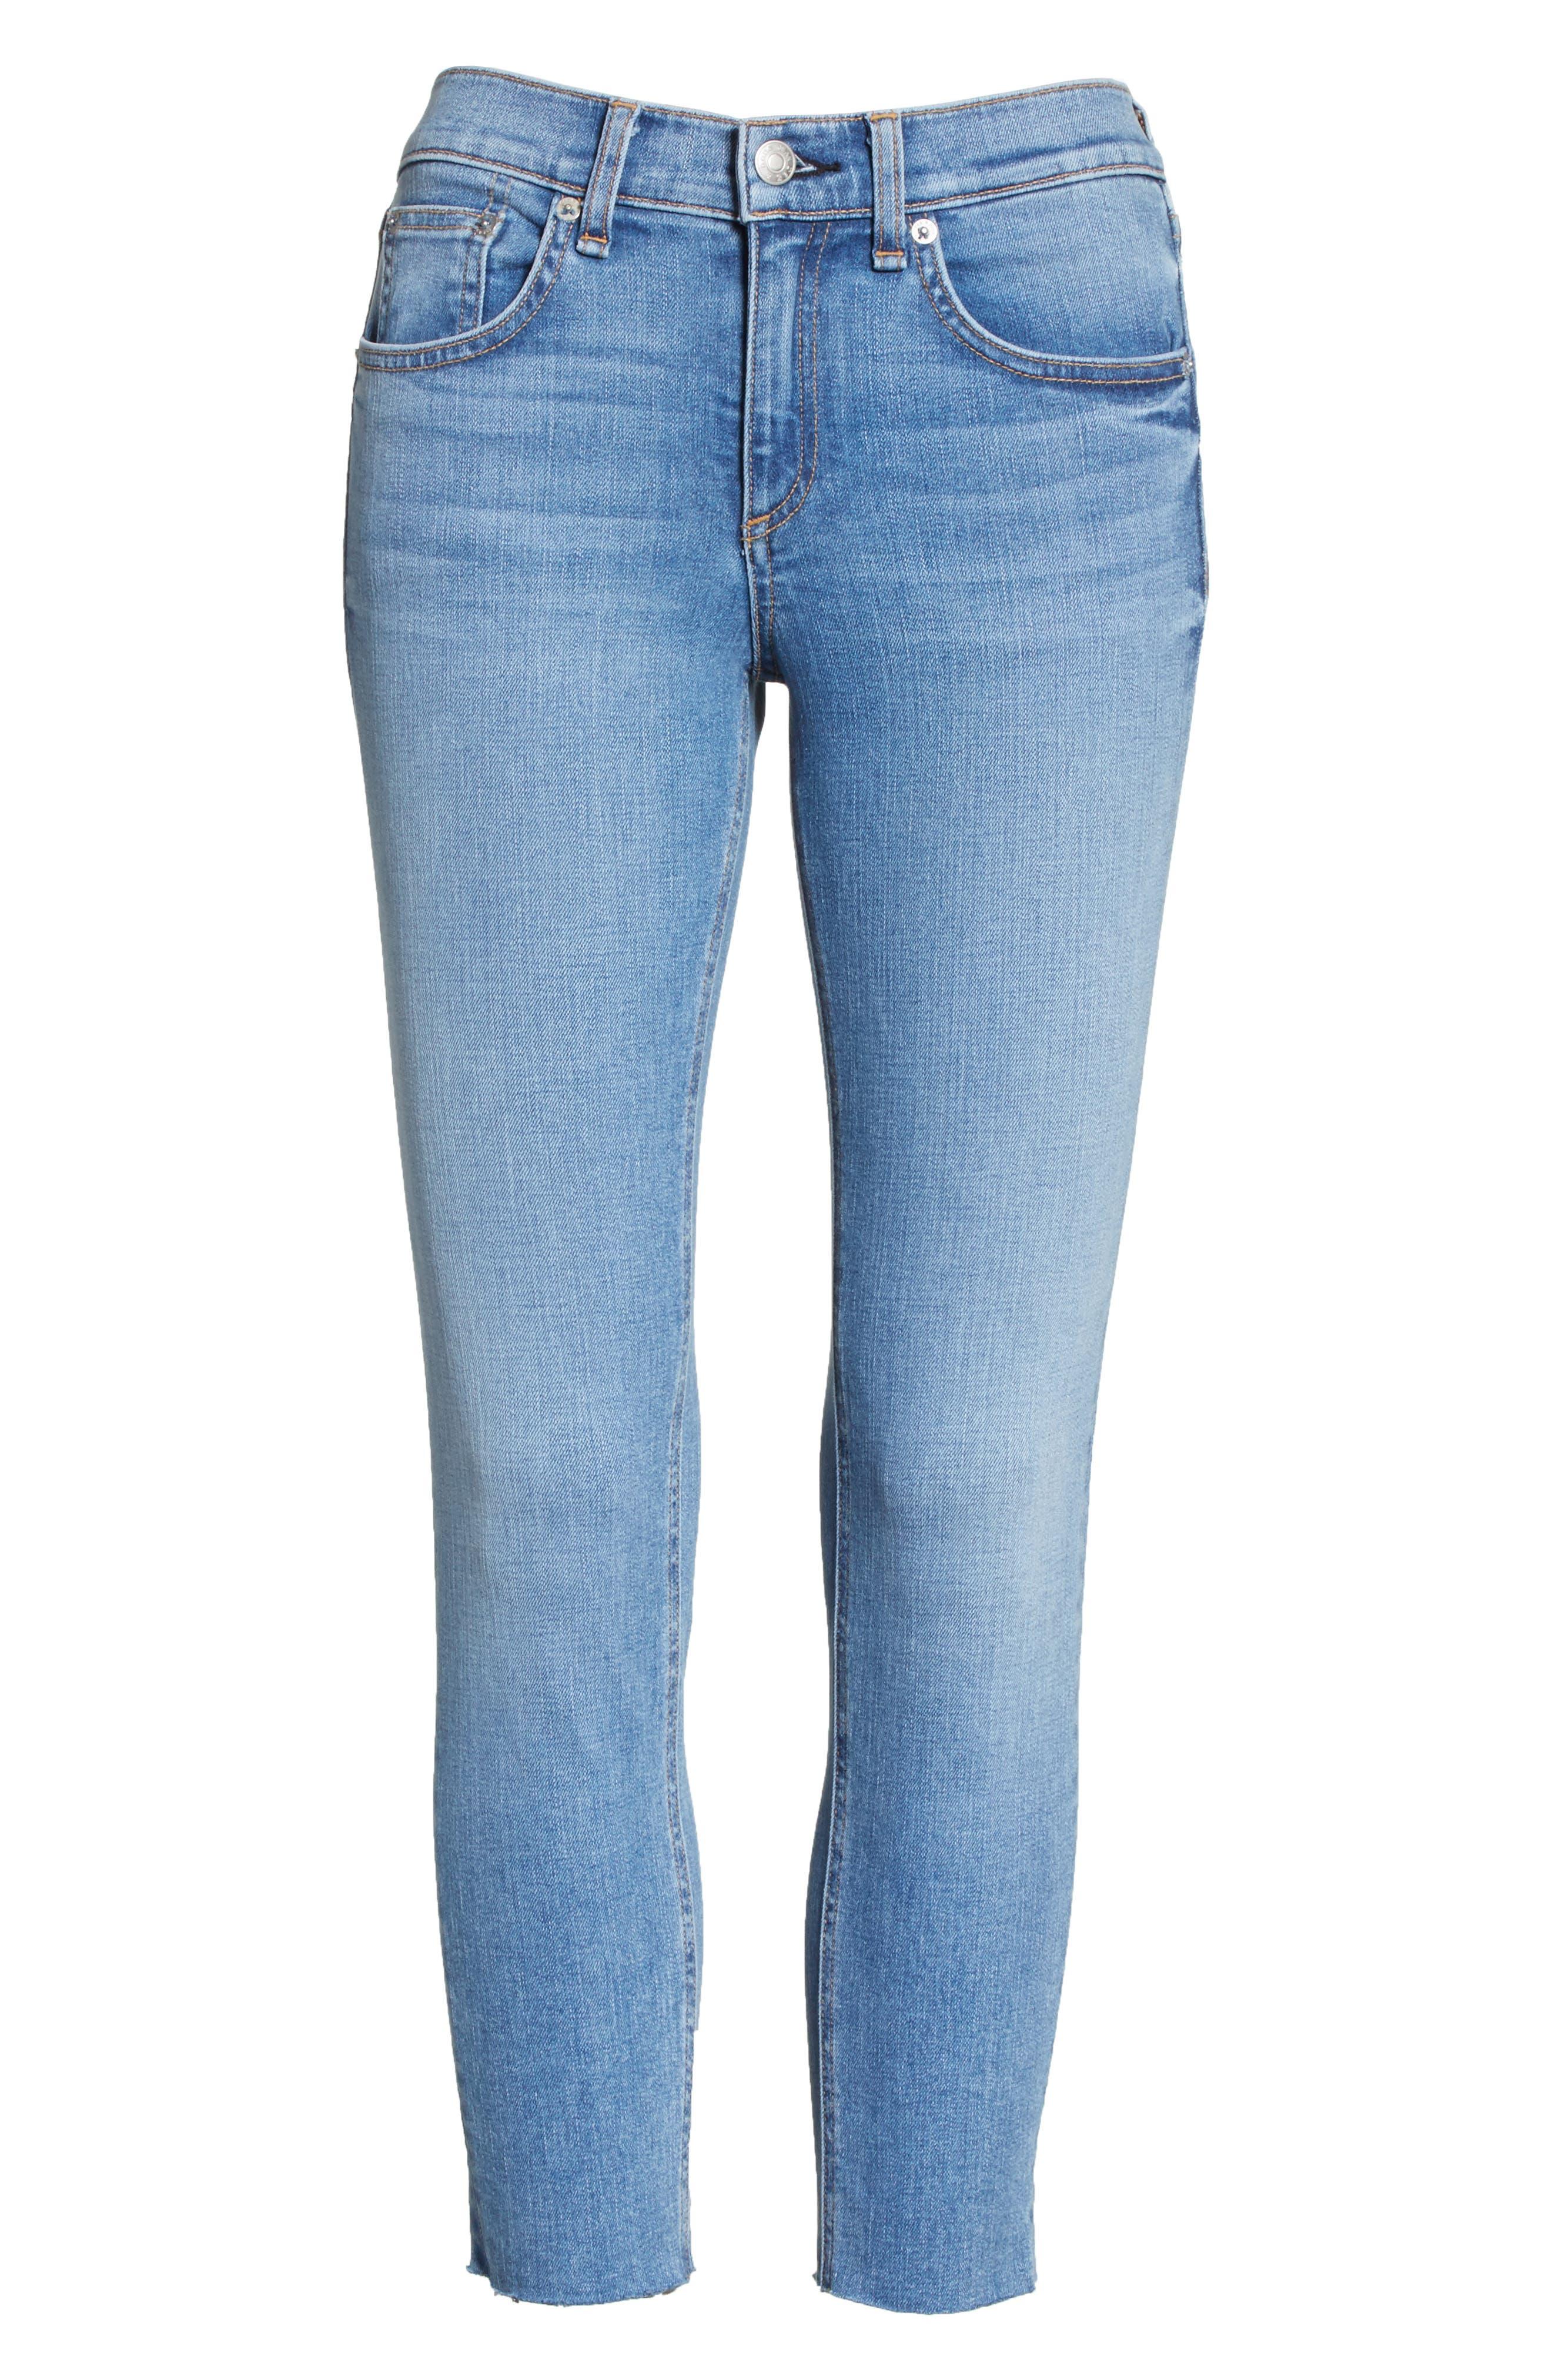 Raw Hem Capri Skinny Jeans,                             Alternate thumbnail 6, color,                             Levee